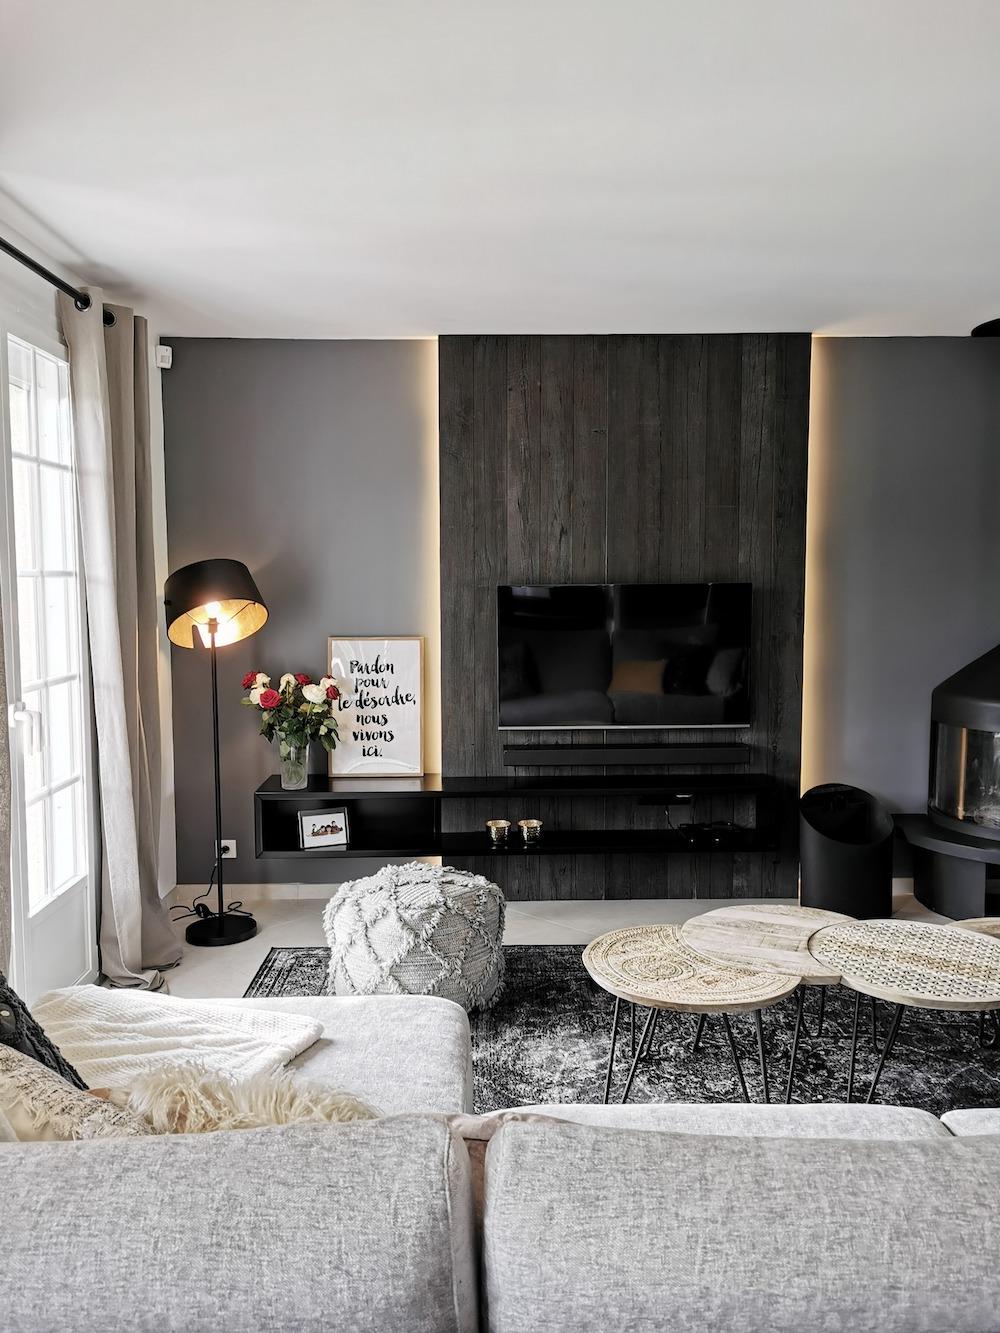 Renovation-maison-salon-serris-77-large-5